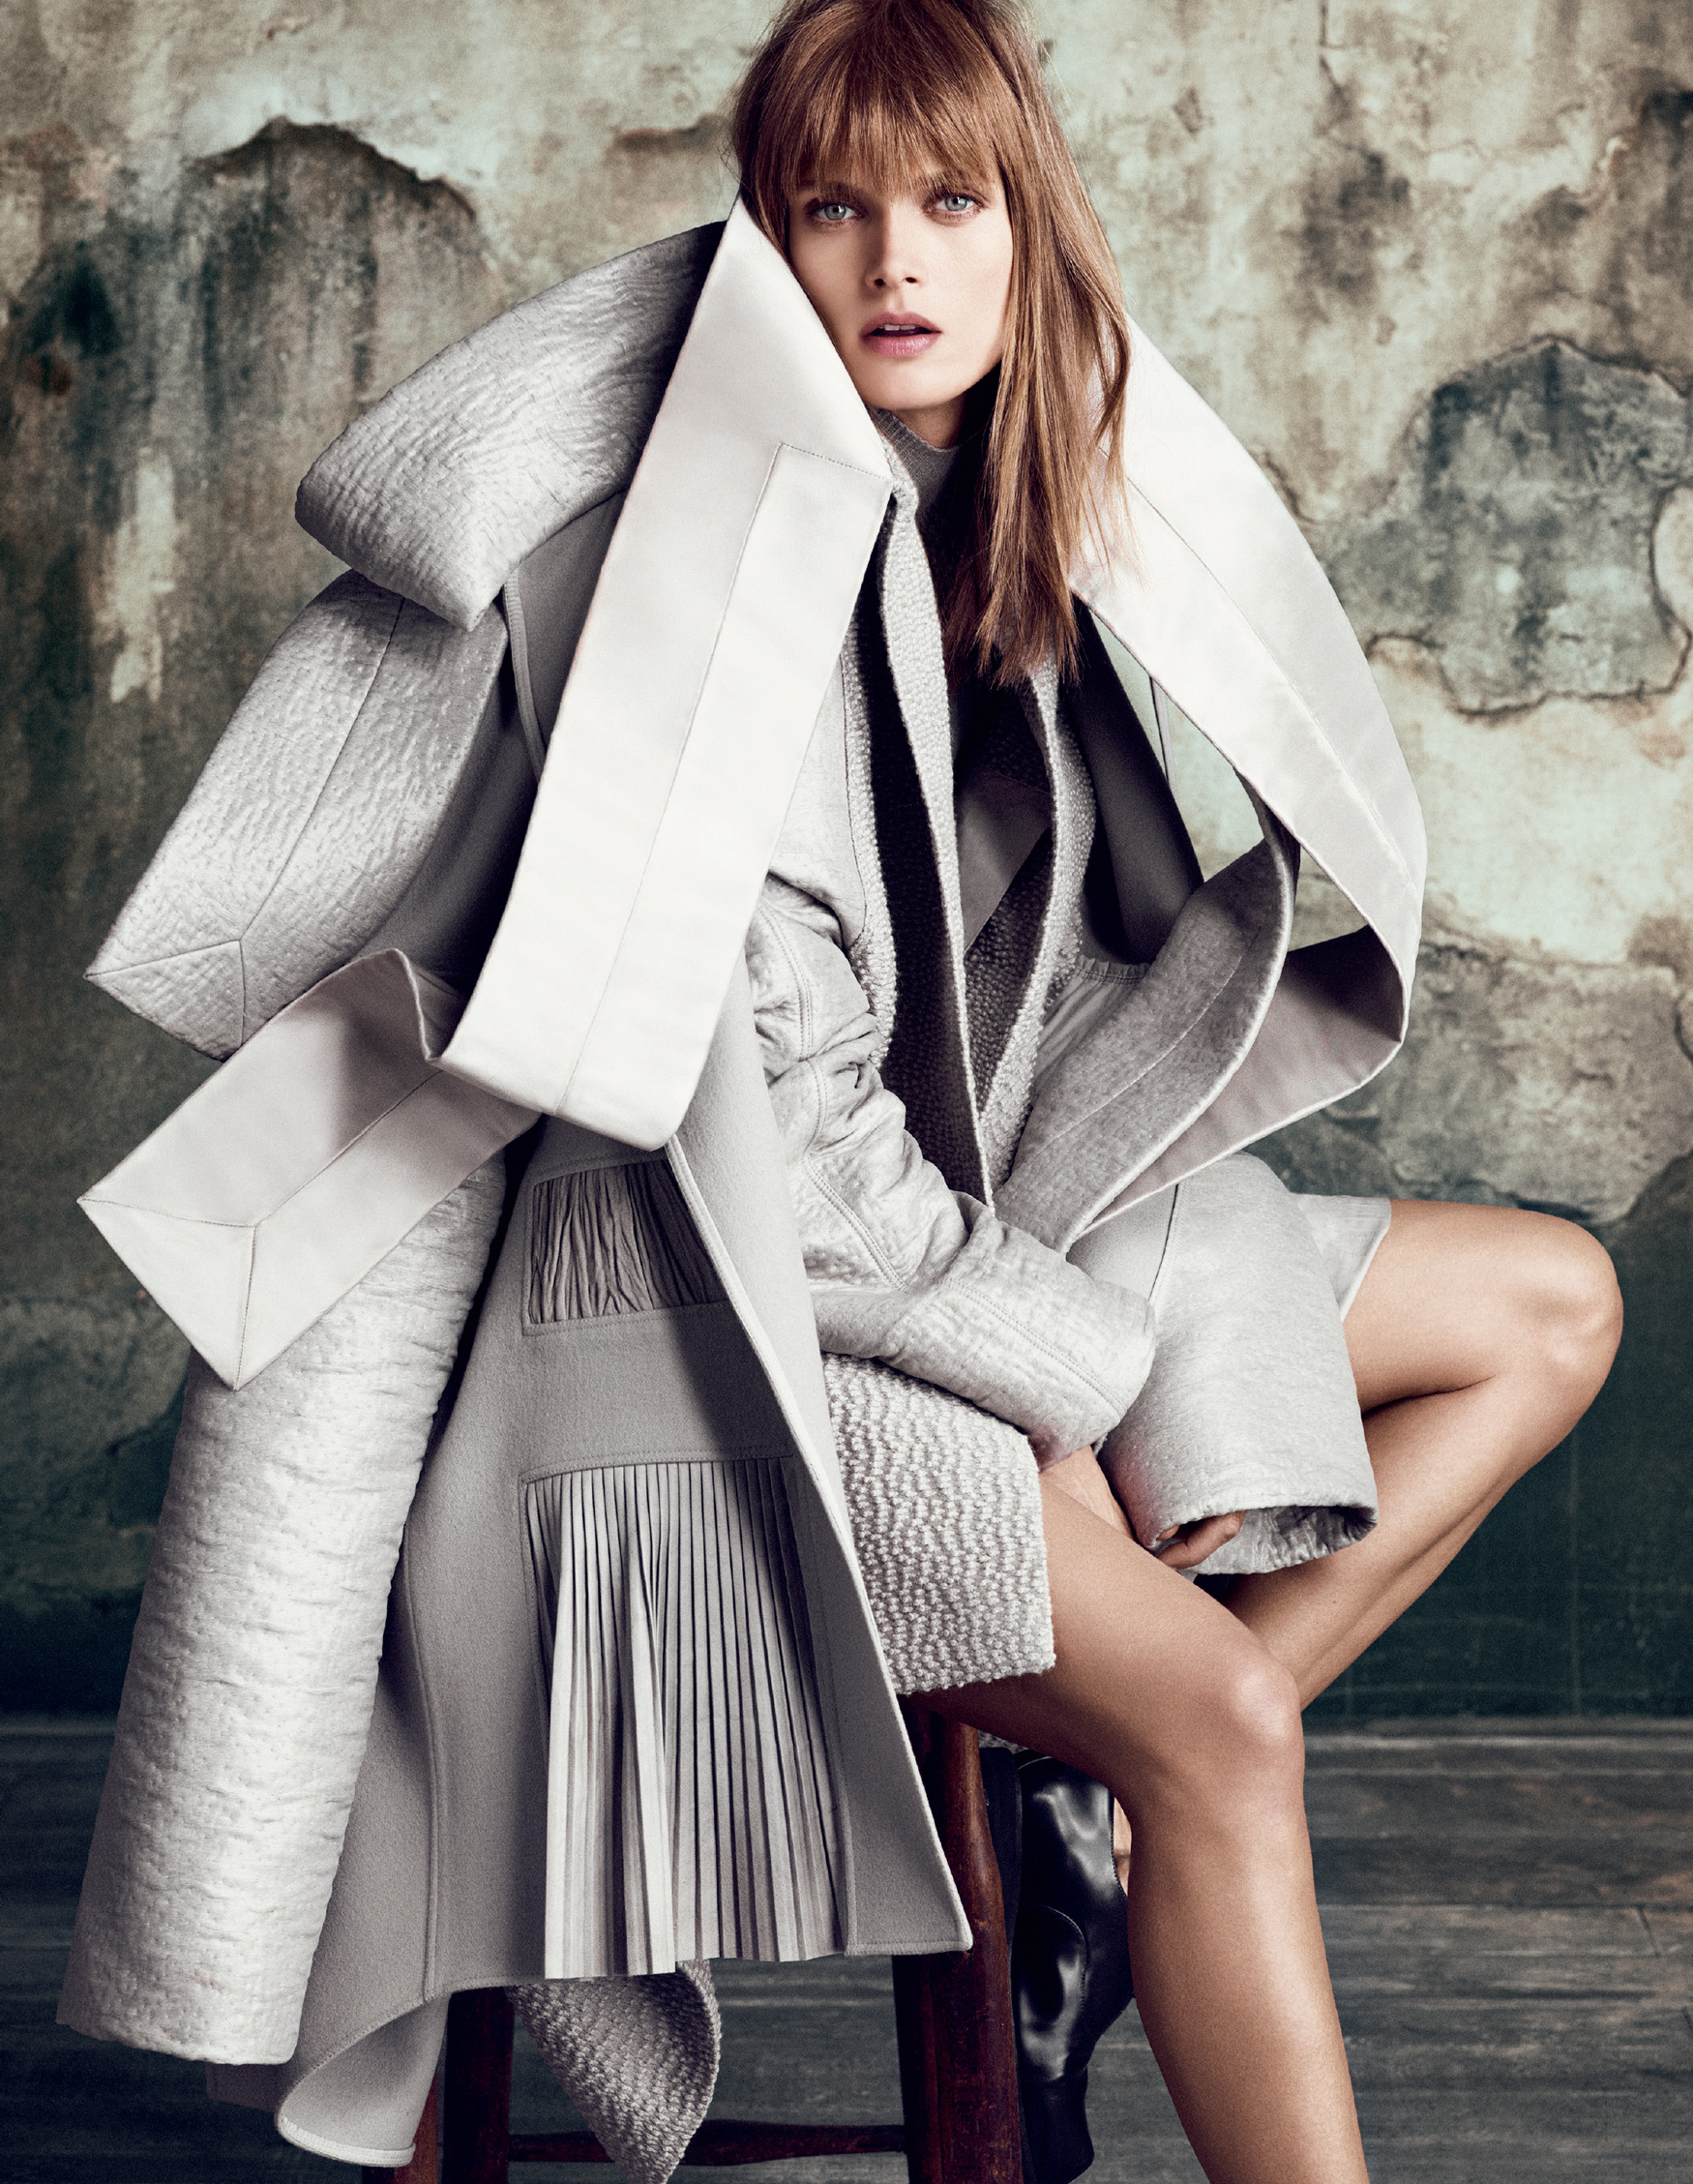 Giovanna-Battaglia-The-Icons-Of-Perfections-Vogue-Japan-15th-Anniversary-Issue-Luigi-Iango-V181_238_200-27-2.jpg